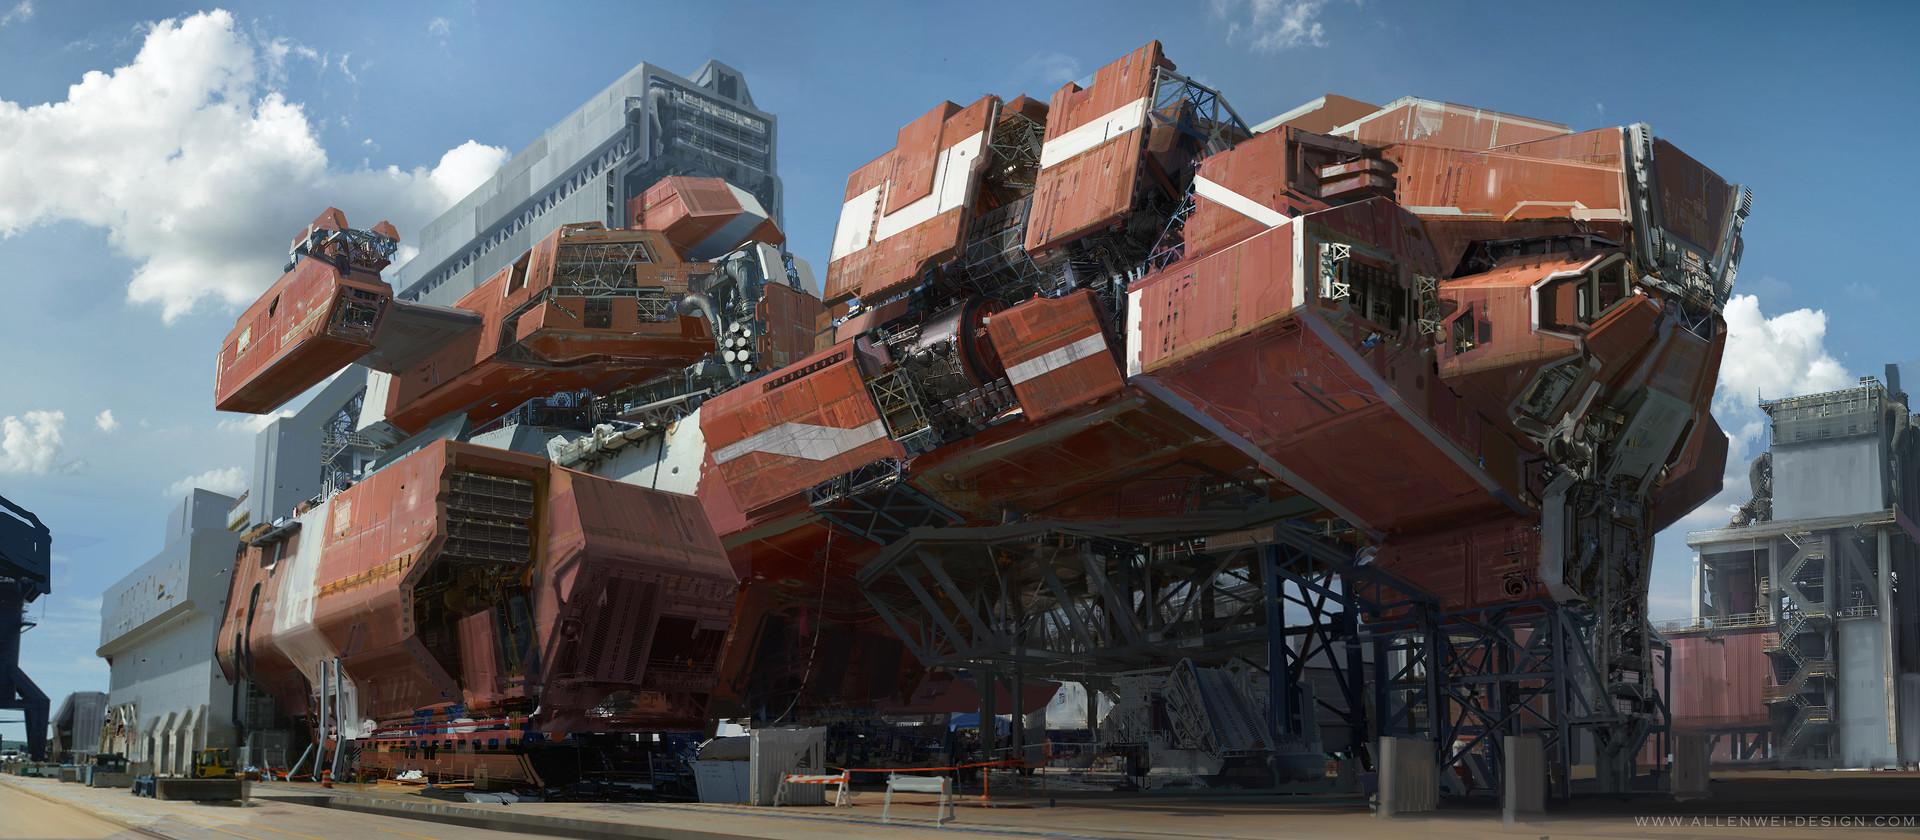 The Futuristic Sci-Fi Creations of Allen Wei